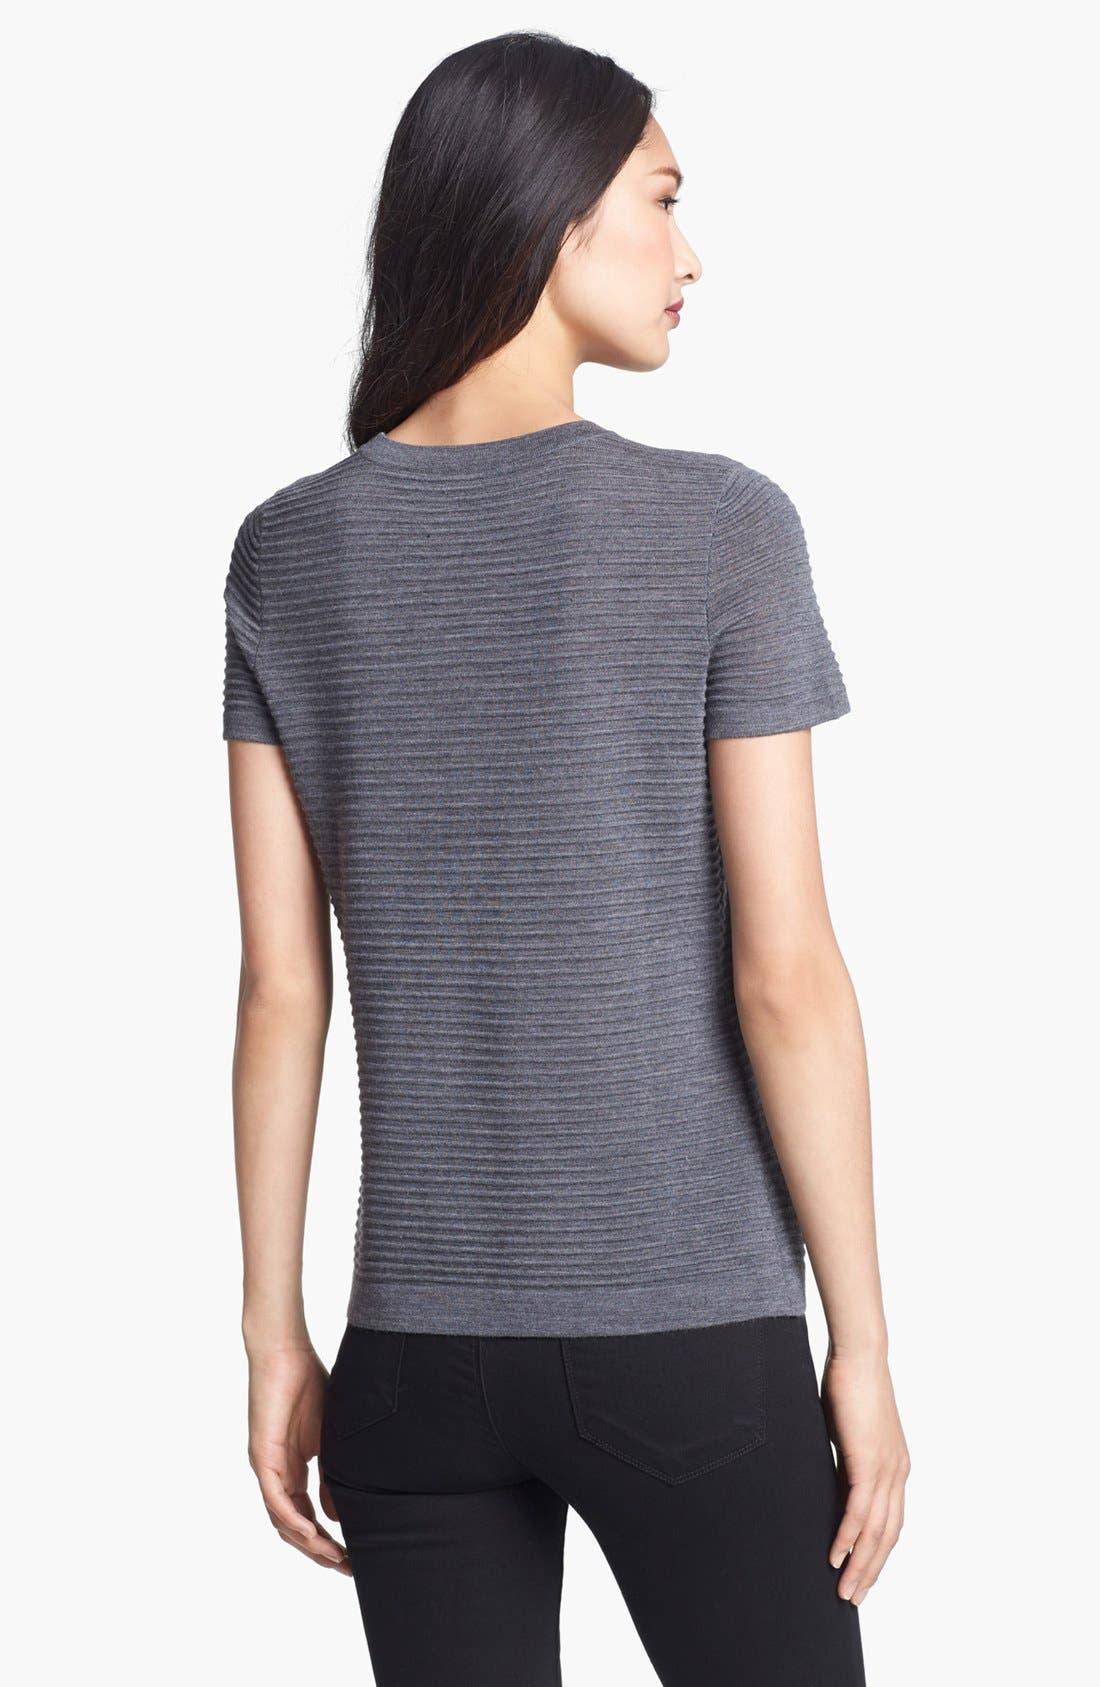 Alternate Image 2  - BOSS HUGO BOSS Textured Short Sleeve Top